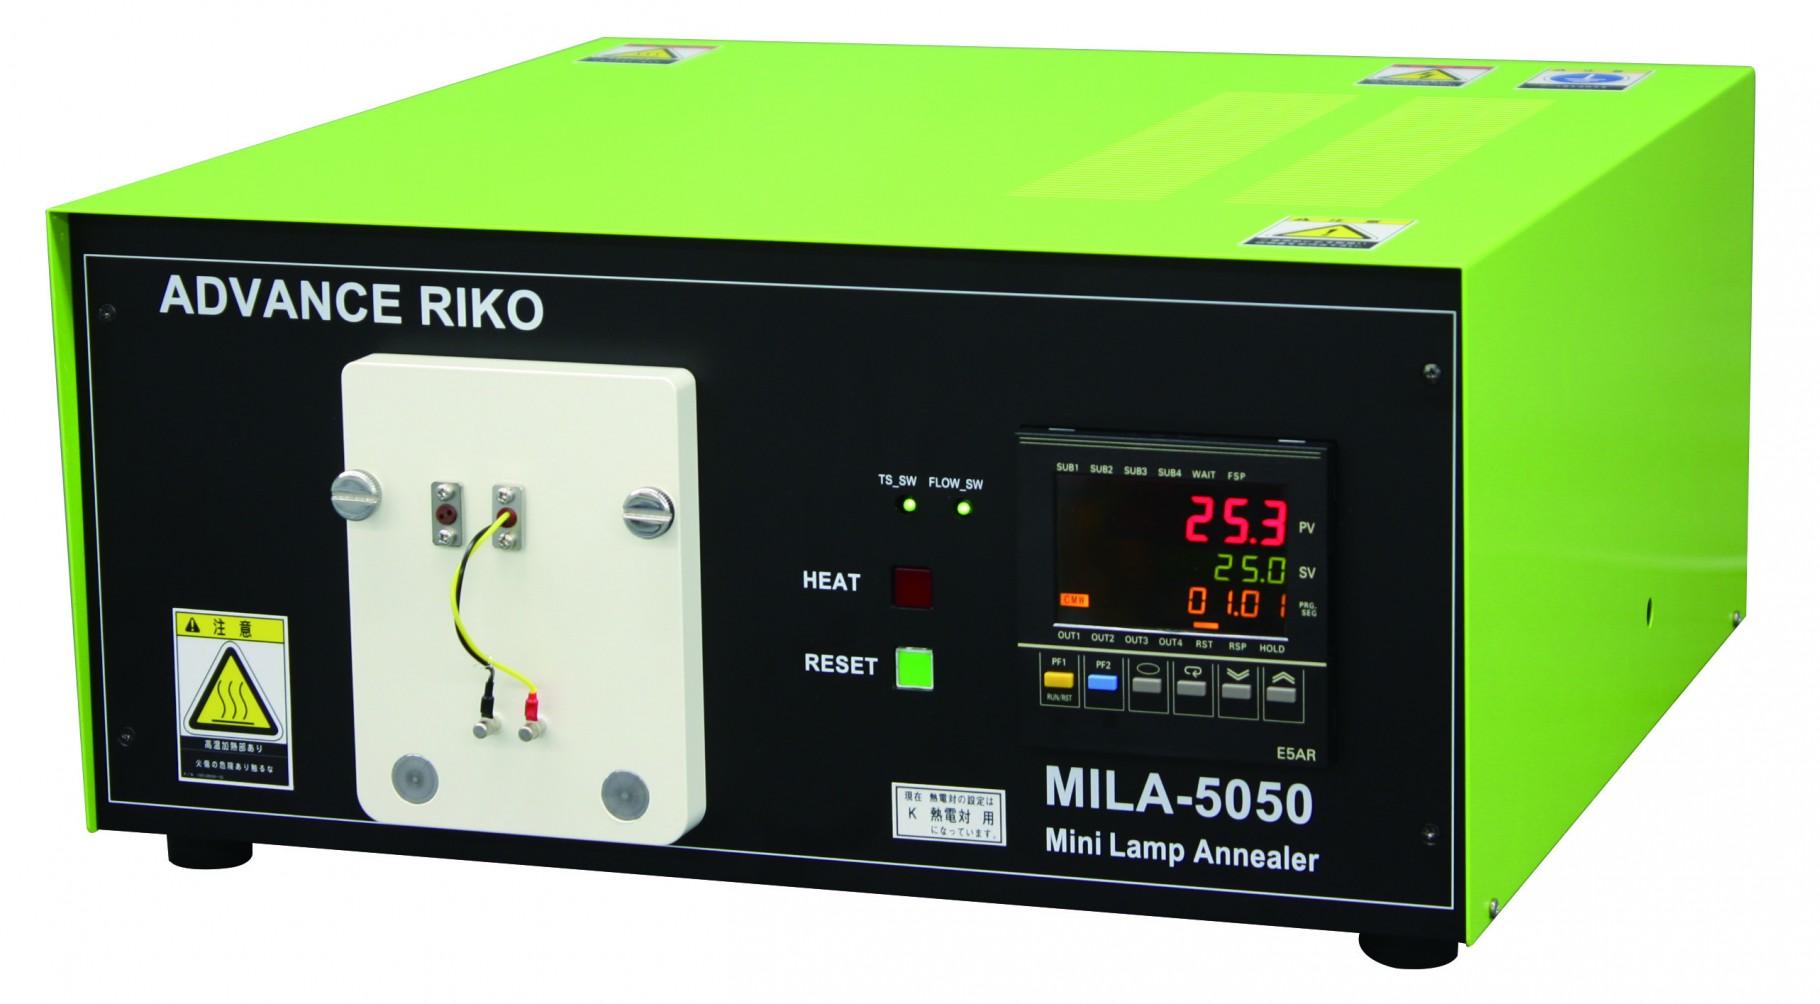 MINI LAMP ANNEALER MILA 5050